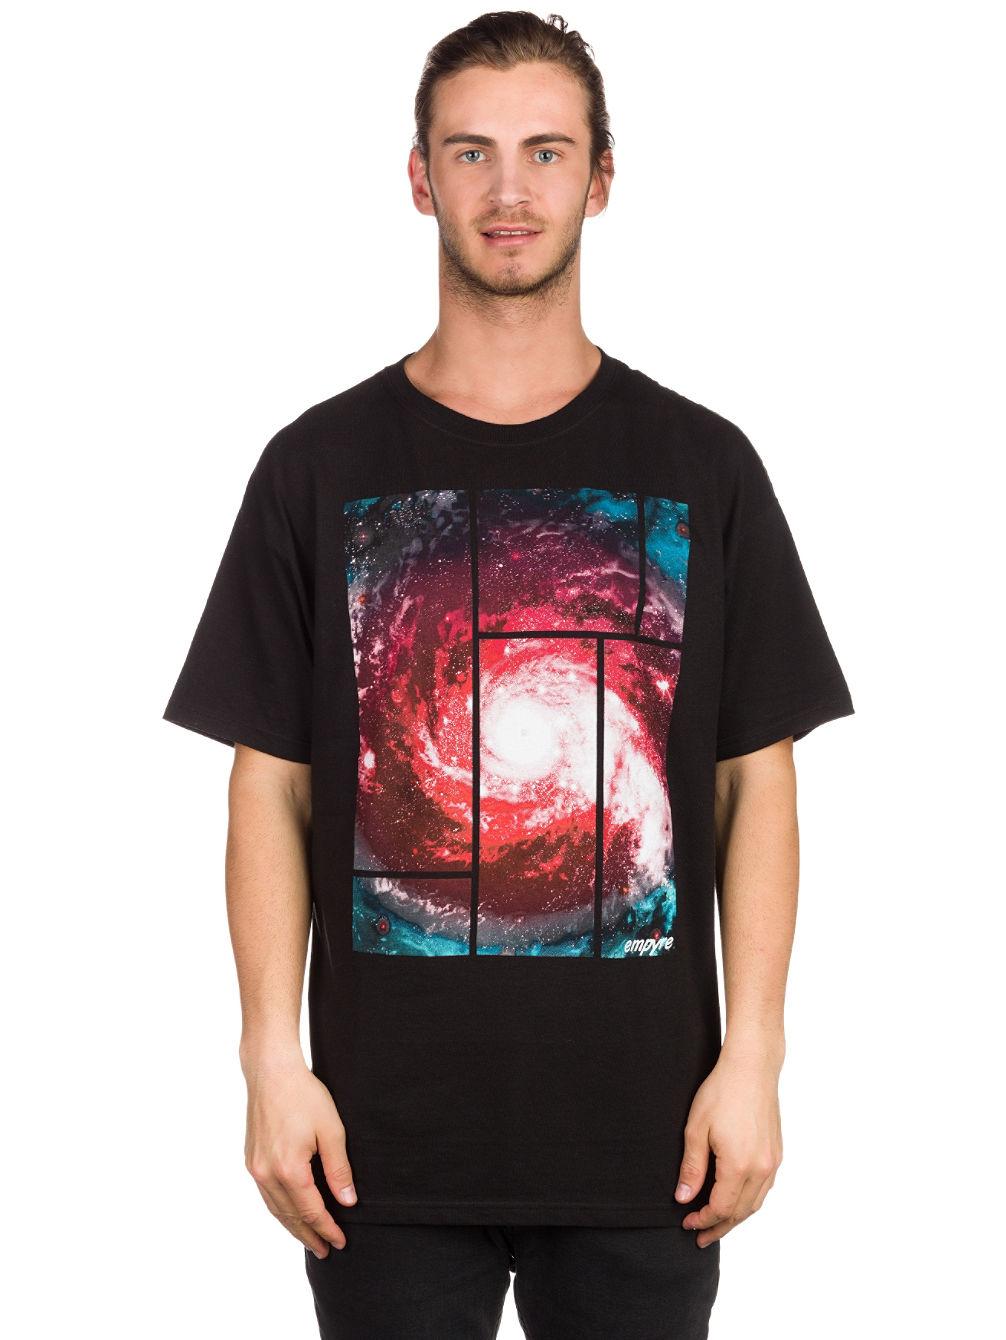 Galaxy Explosion T-Shirt